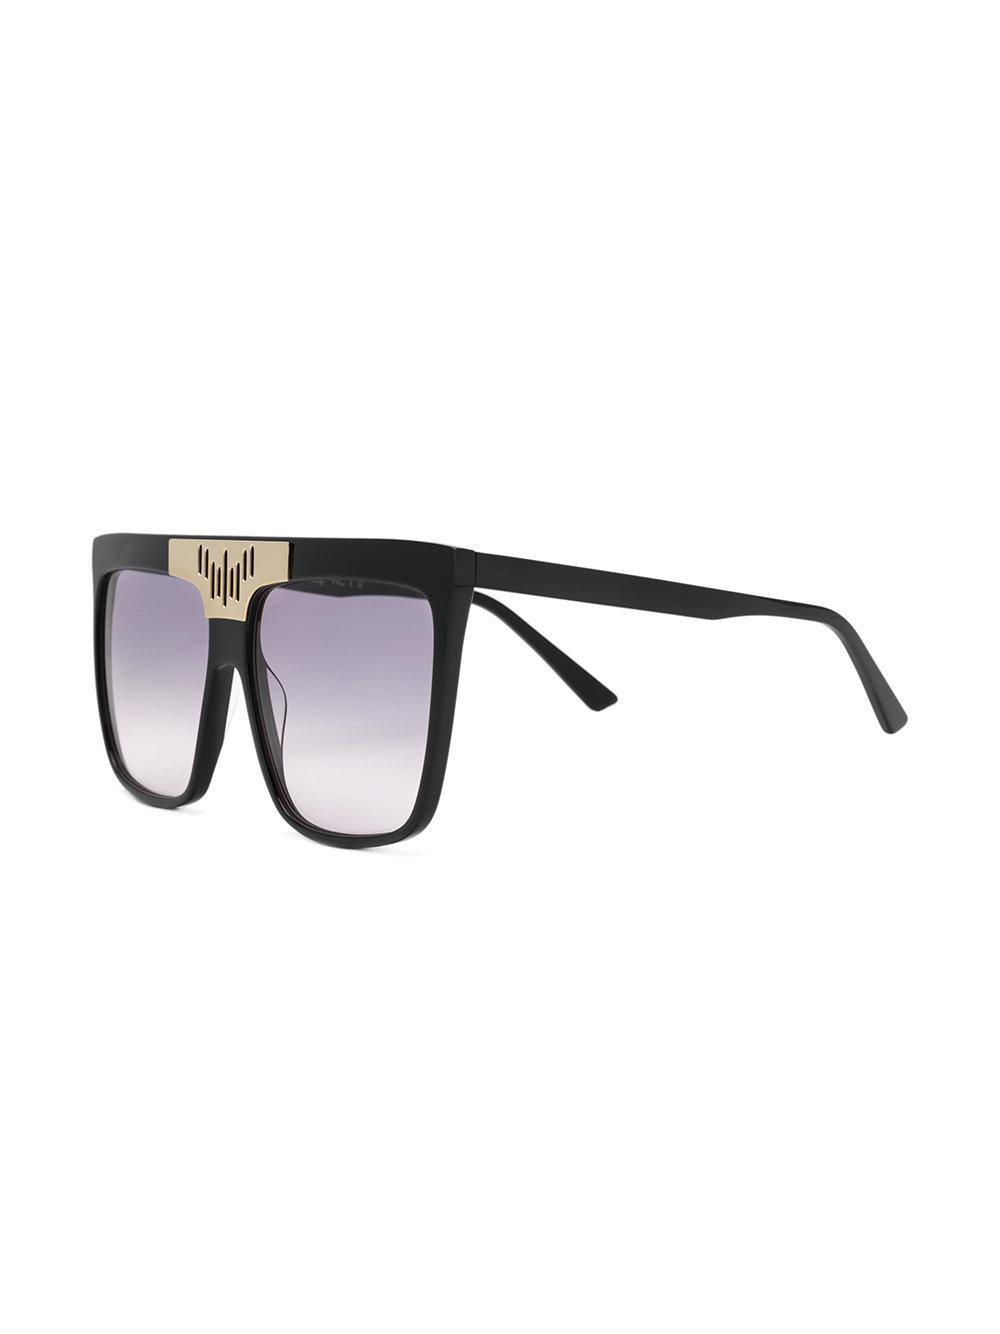 Vic sunglasses - Black Wanda Nylon 73MOGO7L